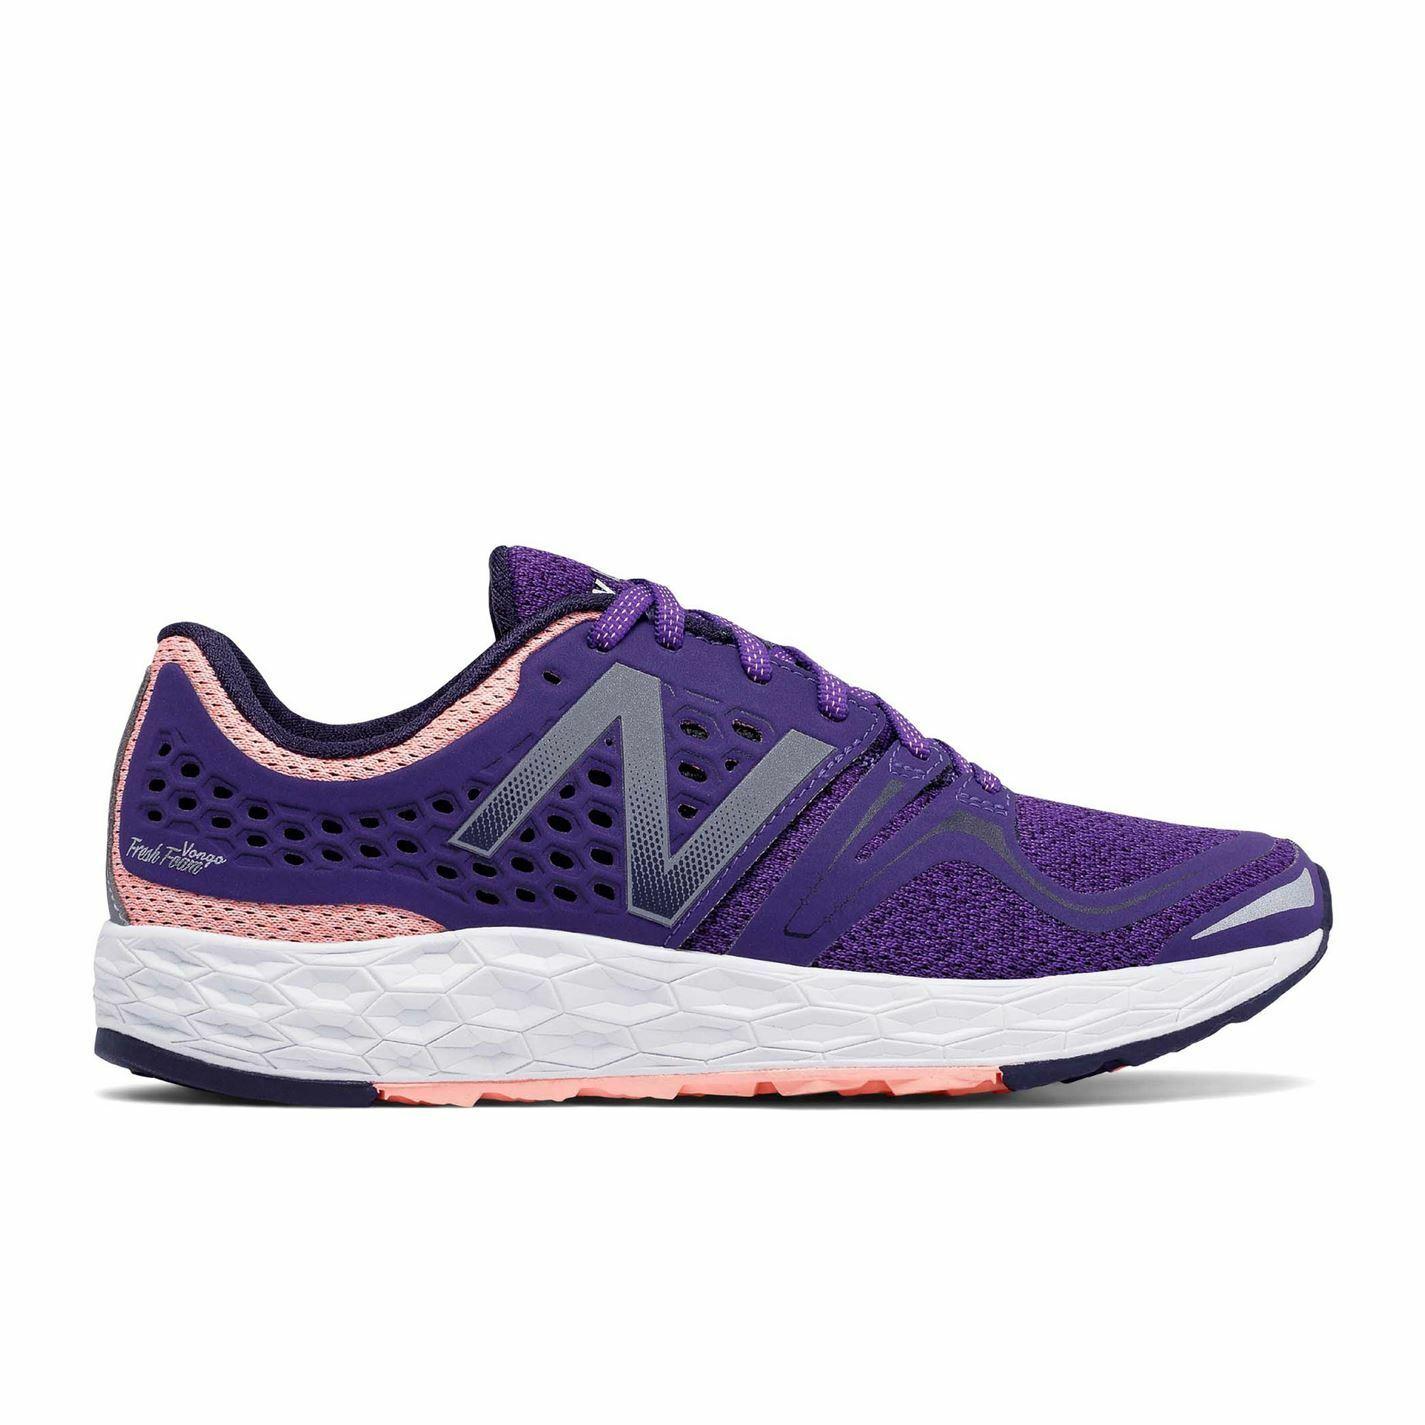 New Balance Vongo Road Running shoes Womens